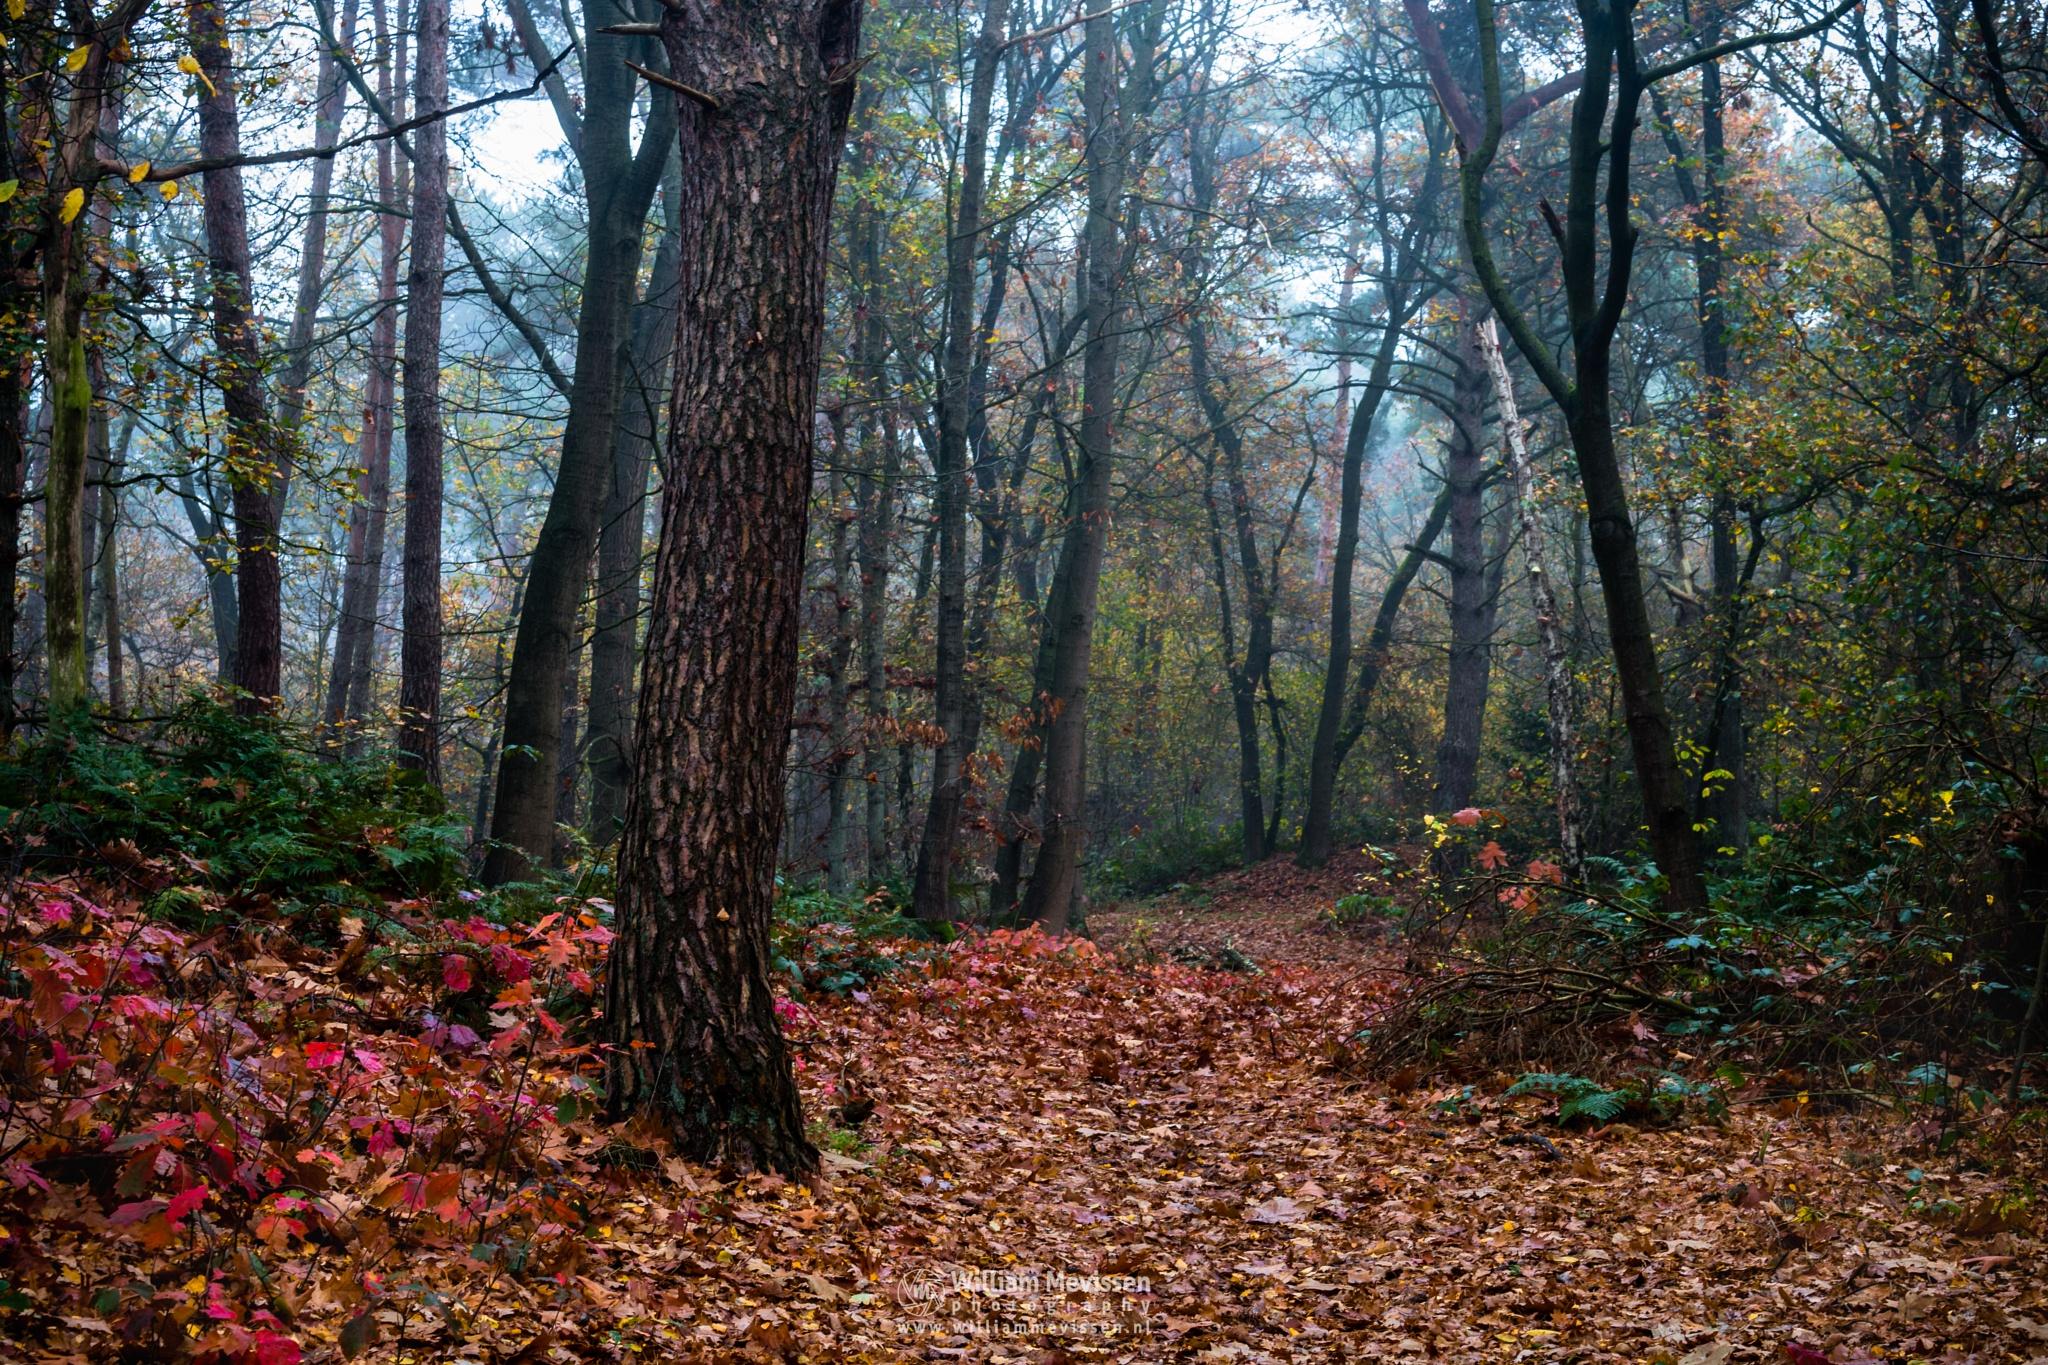 Forest Bridle Path by William Mevissen